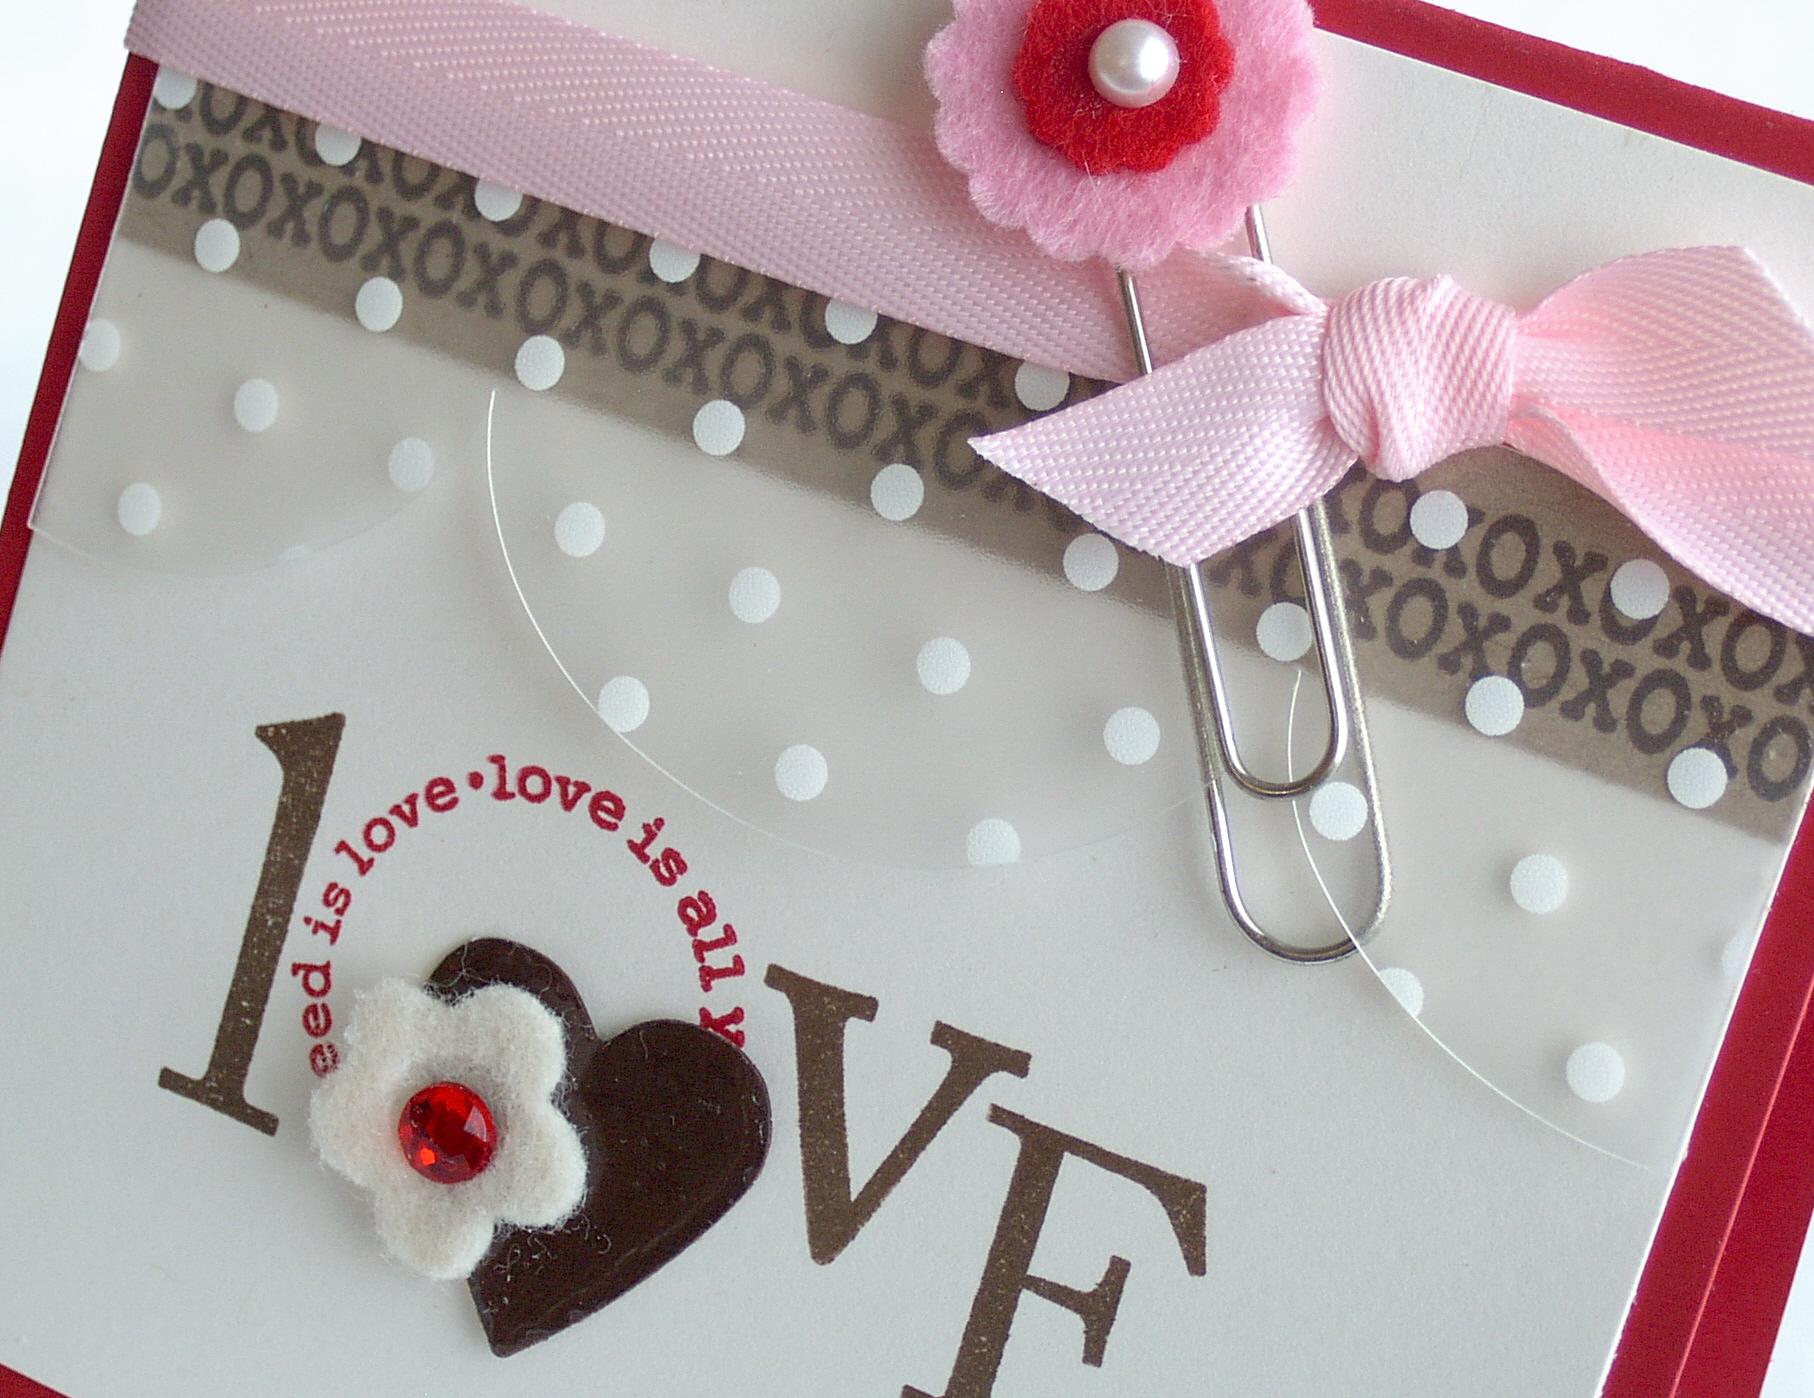 Loveis2